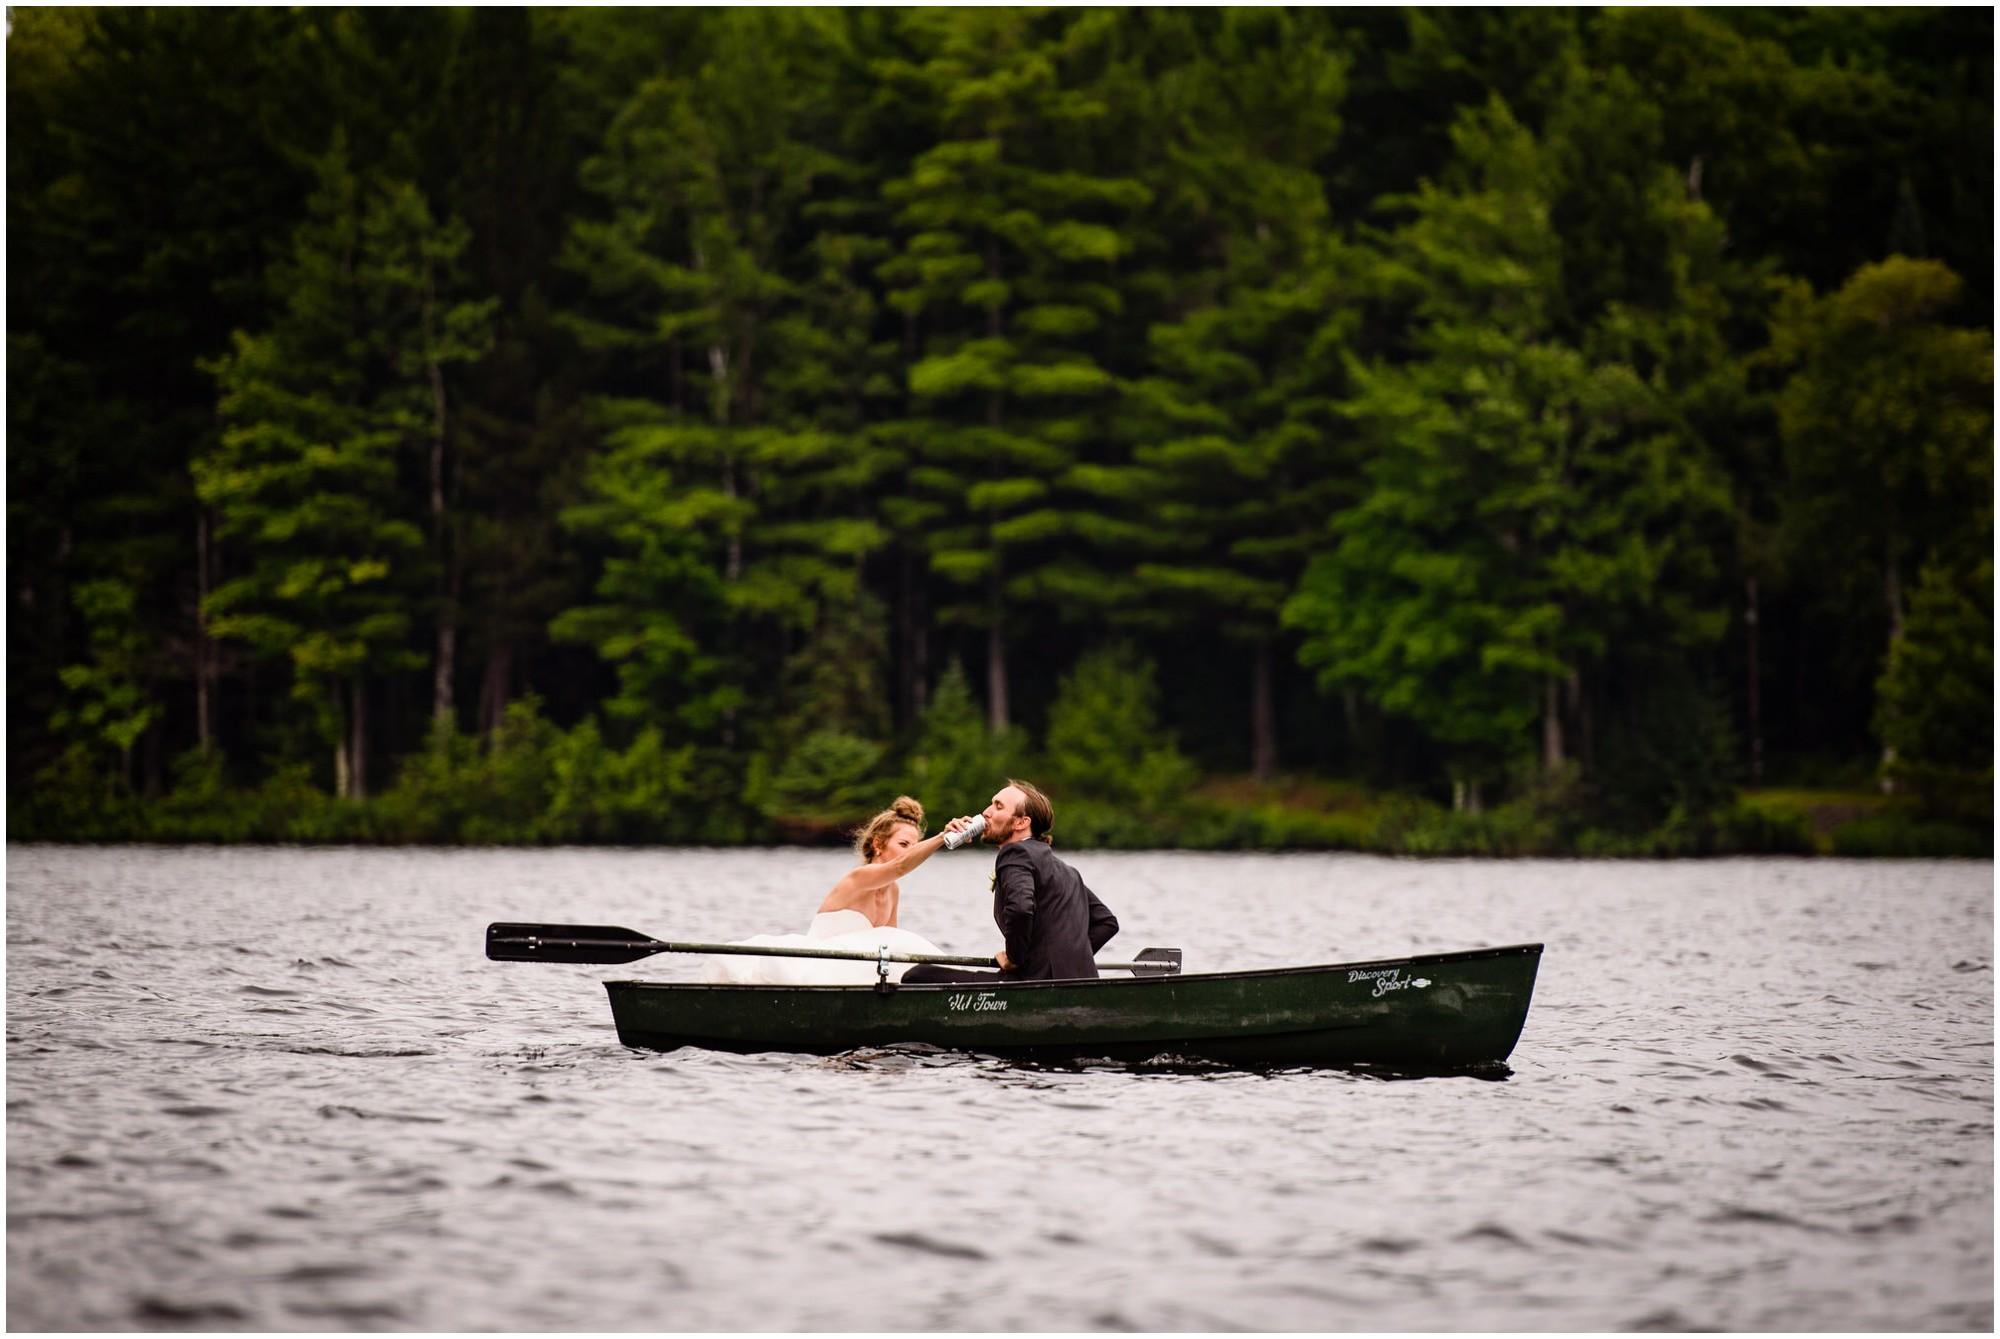 428-Northwoods-Wisconsin-island-wedding.jpg